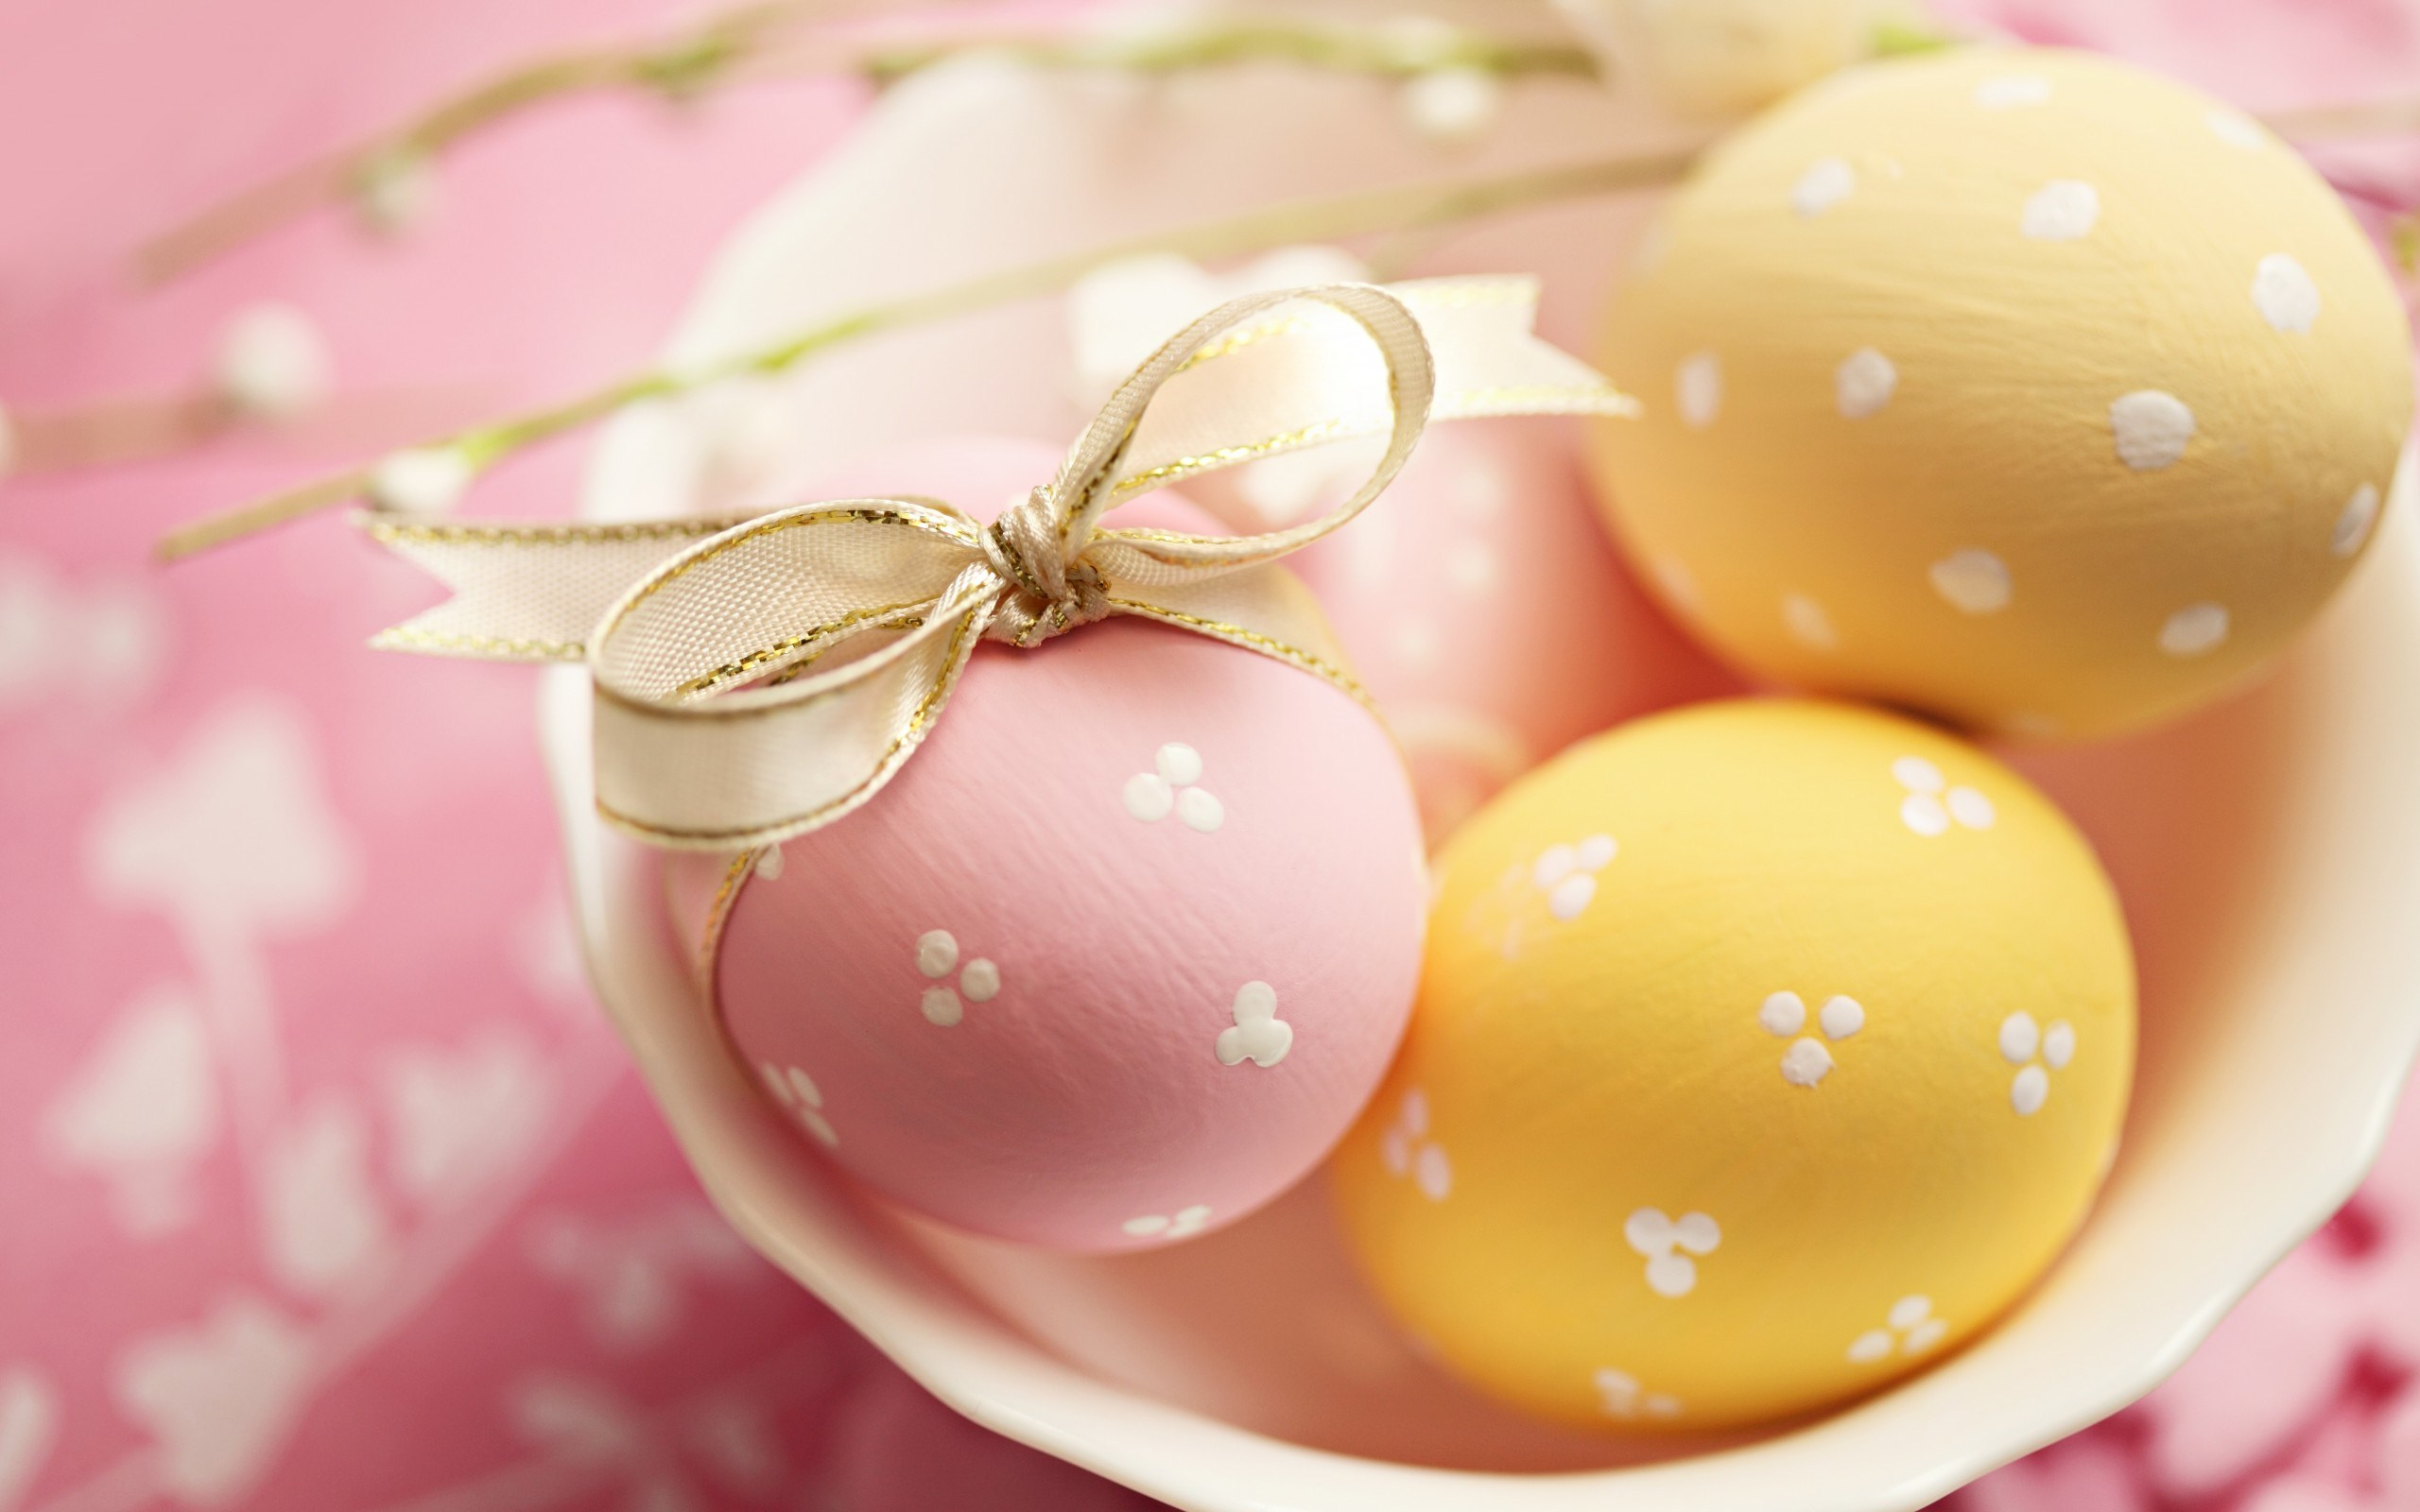 Beautiful Easter Egg wallpaper 2560x1600